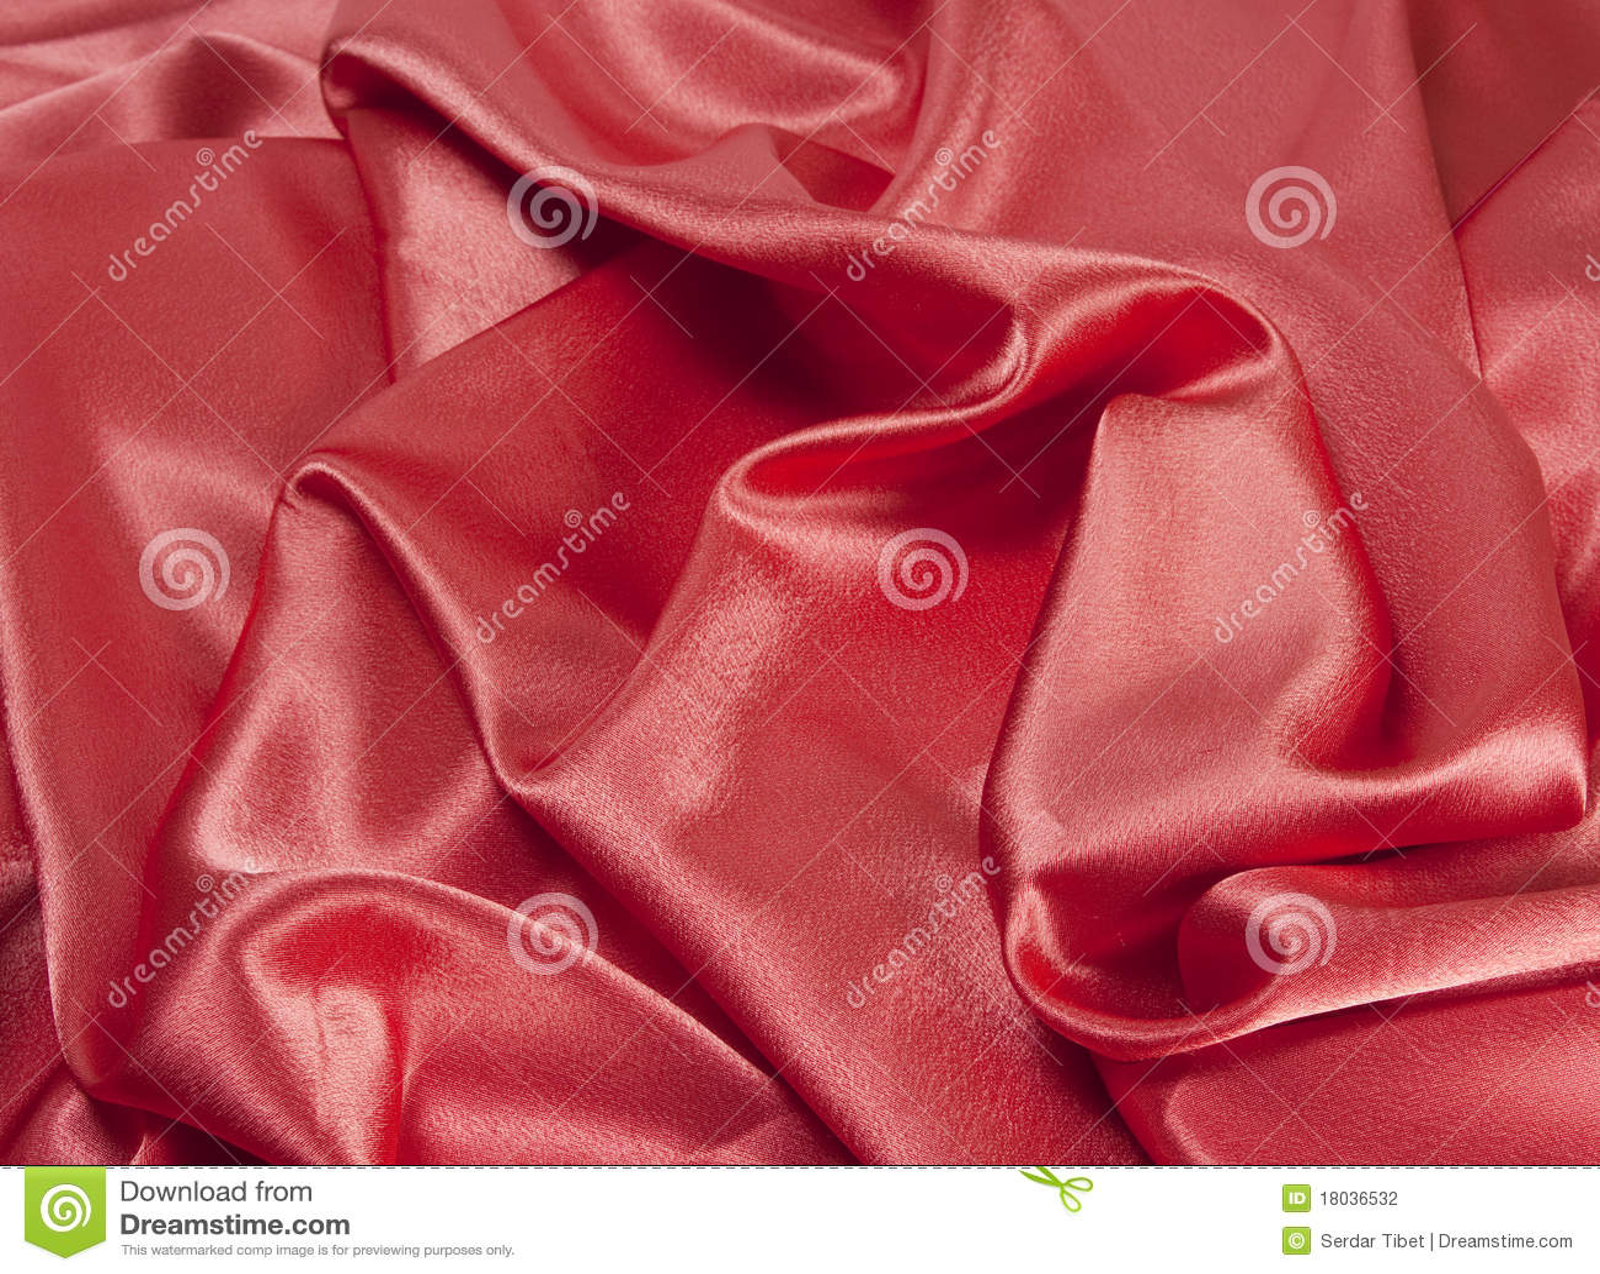 Elegant and light pink satin background Pink Satin Background